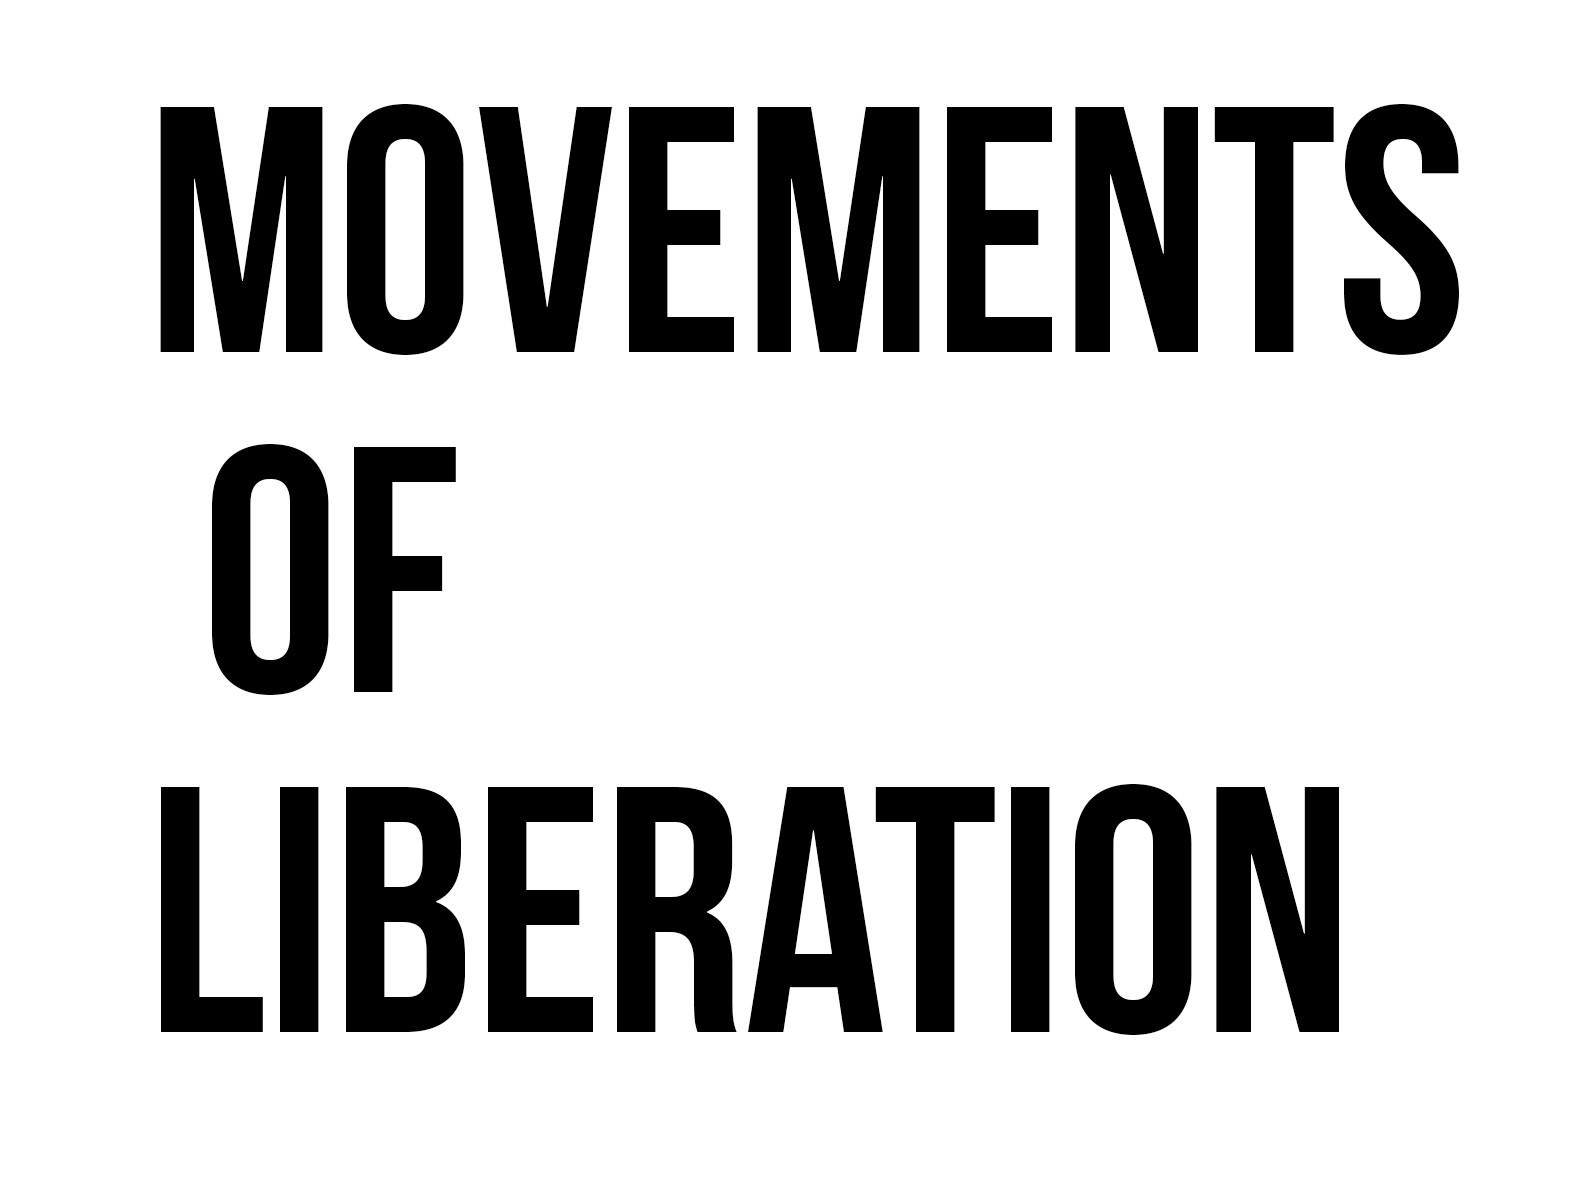 Movements of Liberation